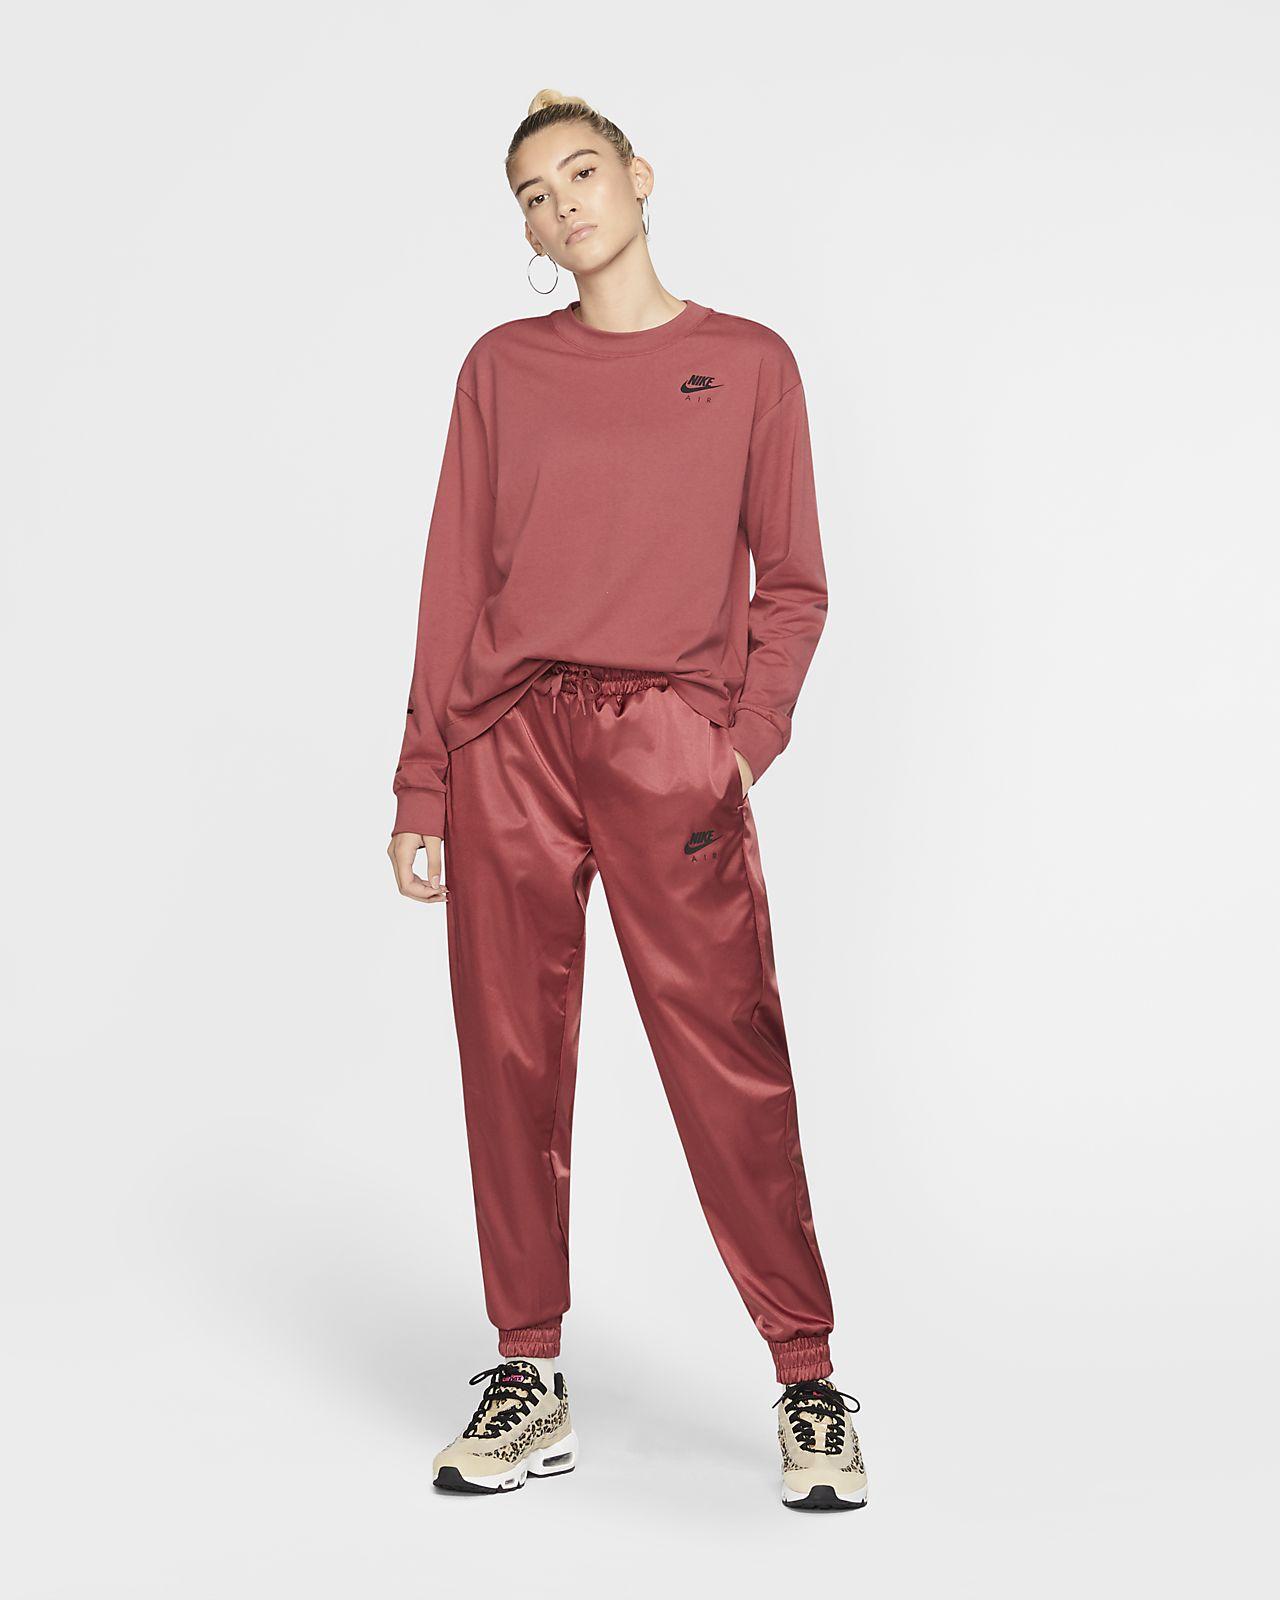 Nike Sportswear Air Damska koszulka z długim rękawem BV5175